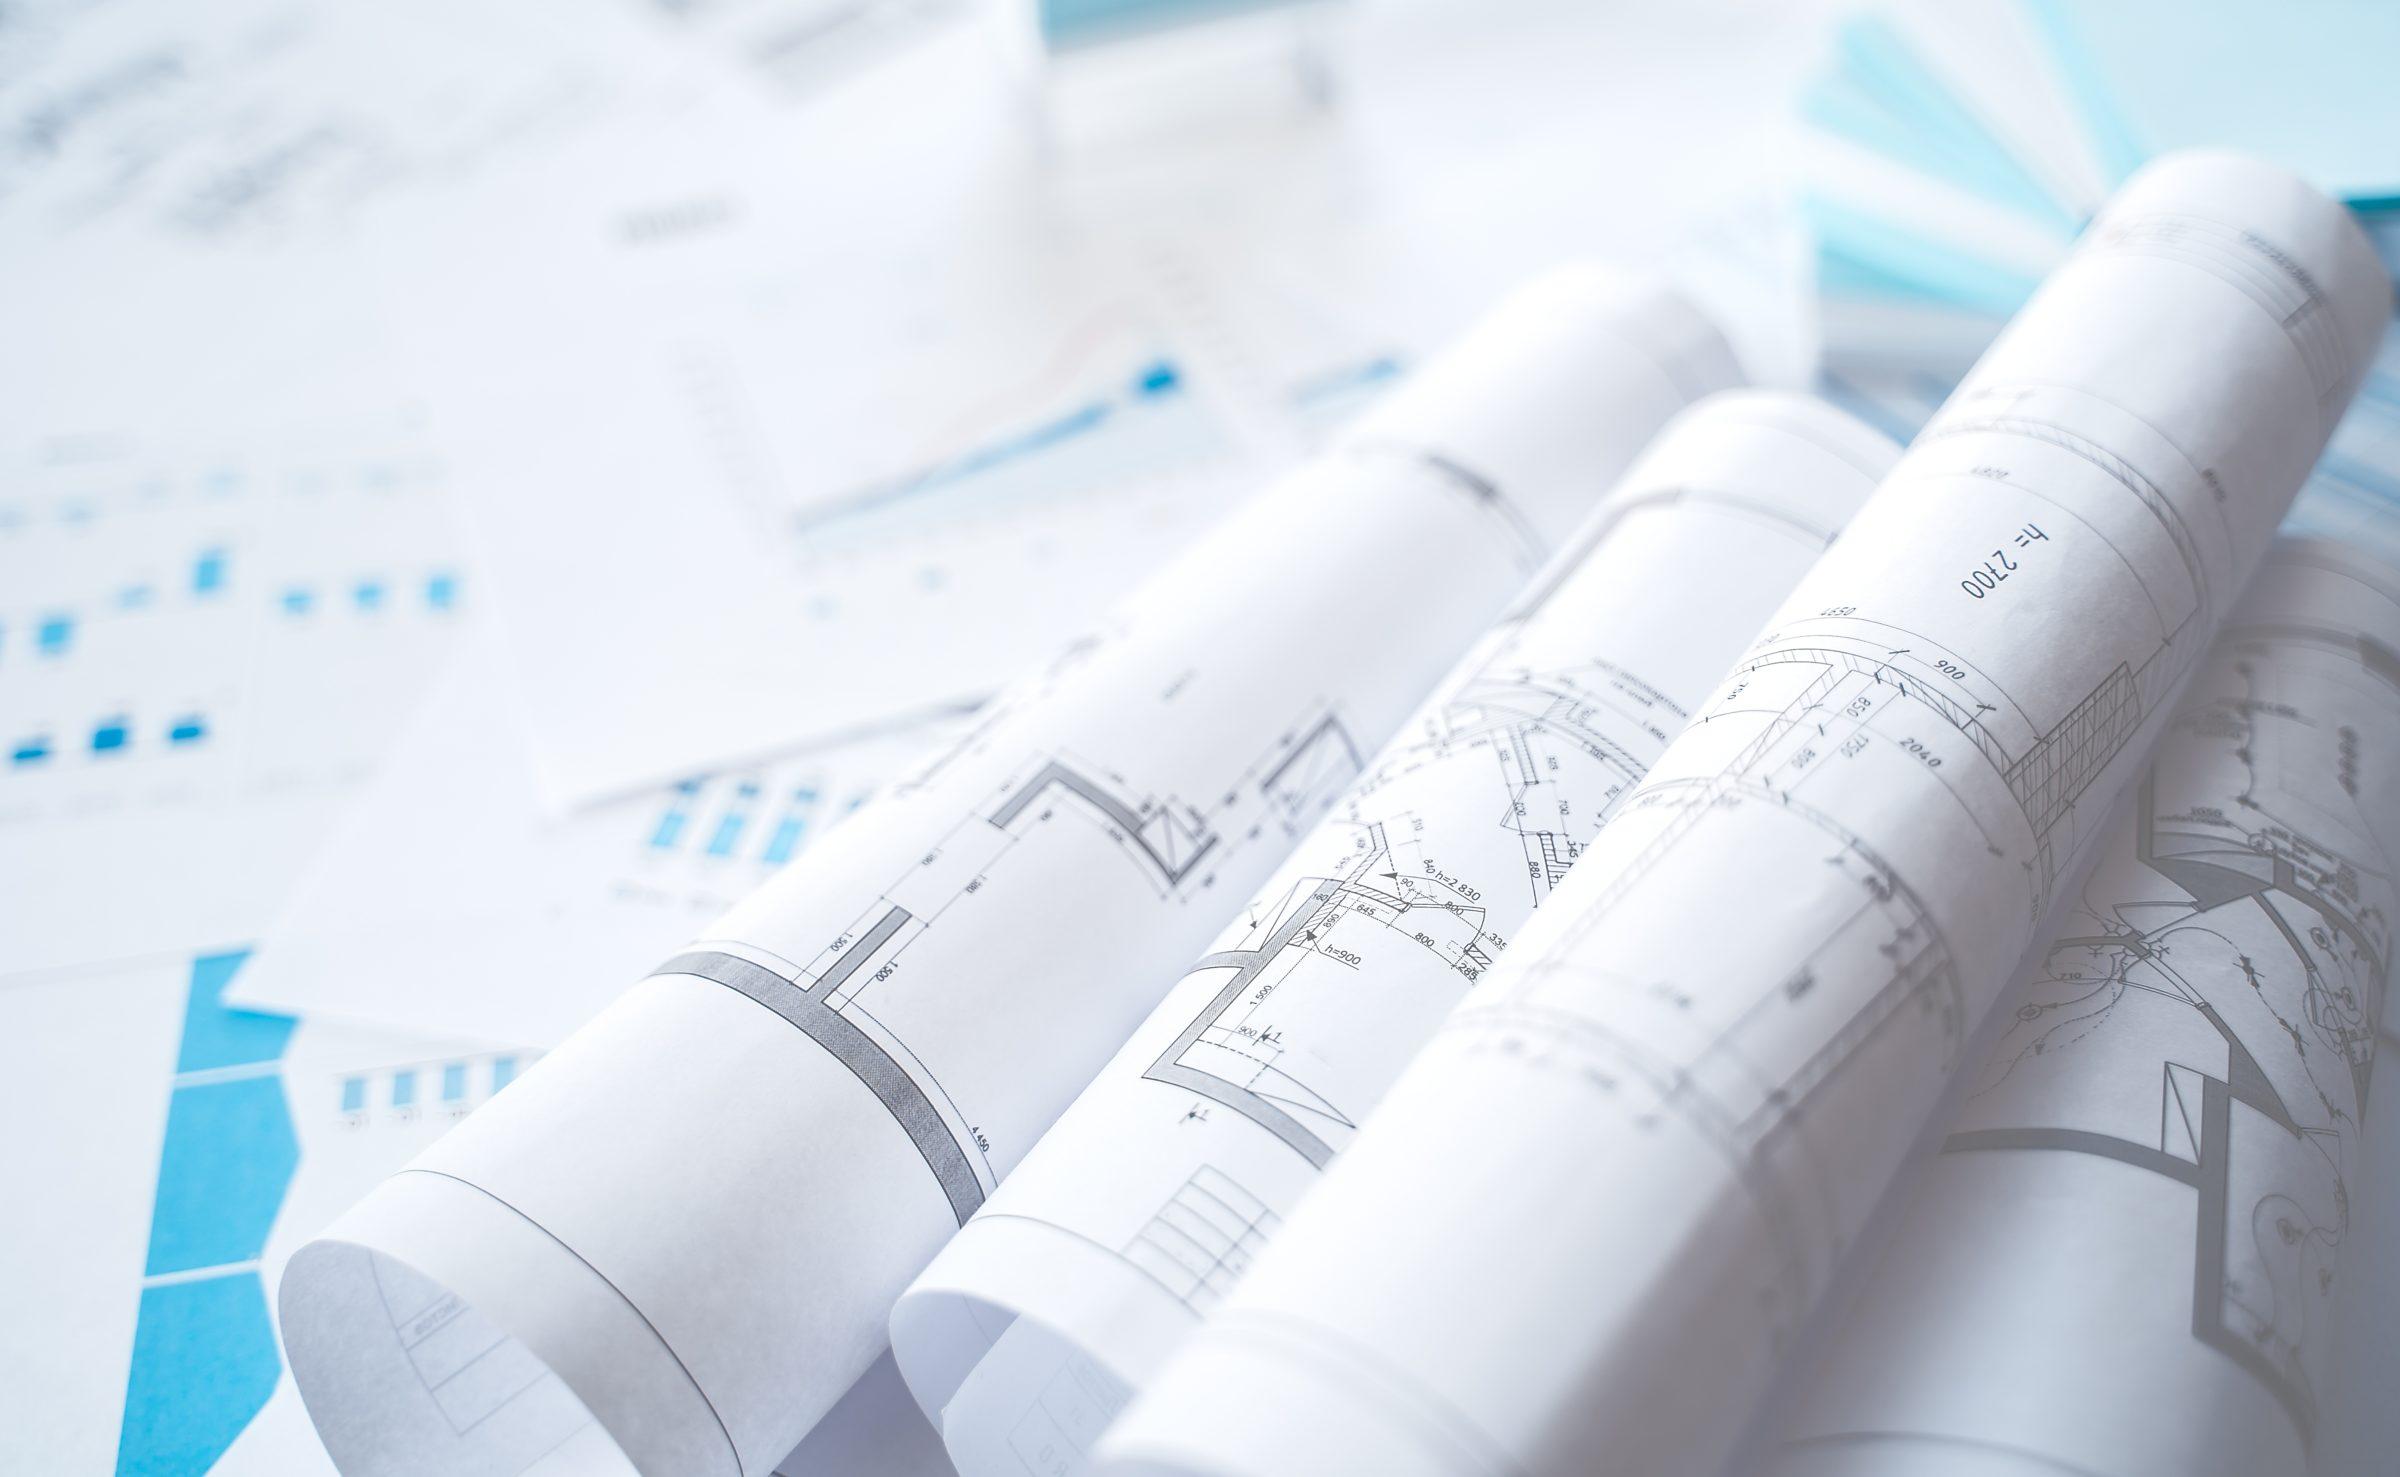 business project documentation development plannin BDARLJG 1